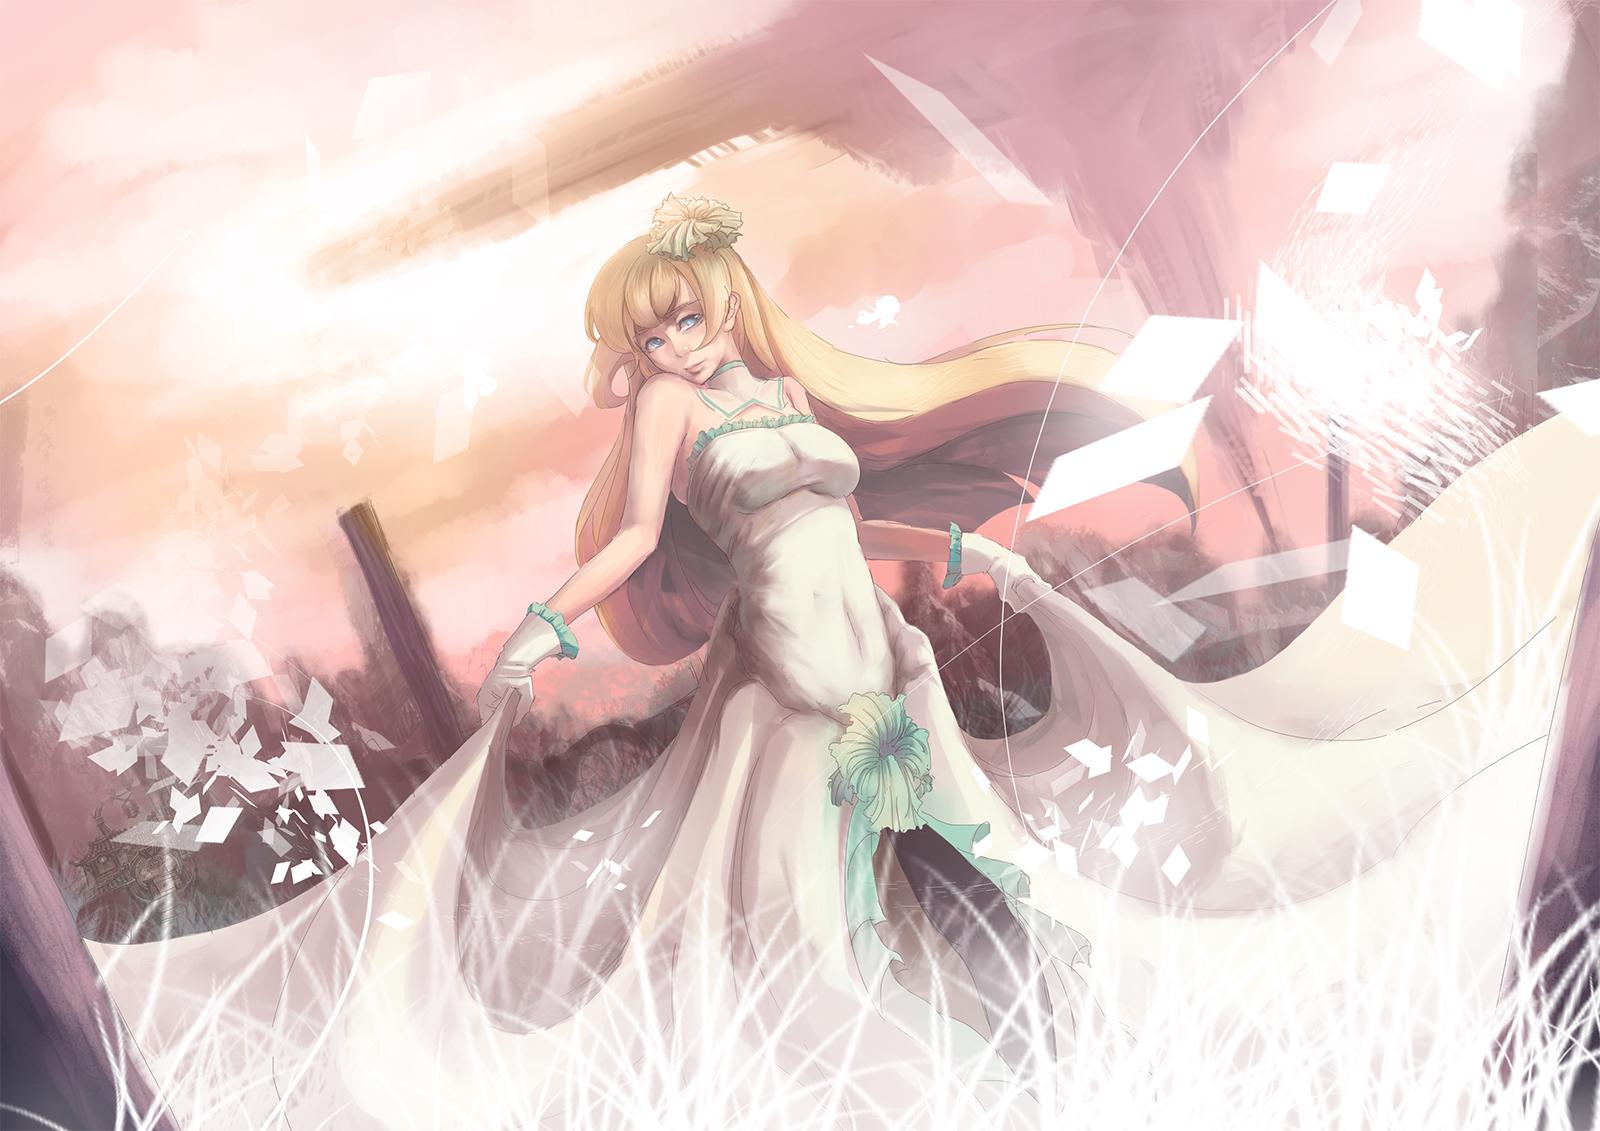 Anime 1600x1131 soft shading dress anime girls anime big boobs blonde long hair white dress